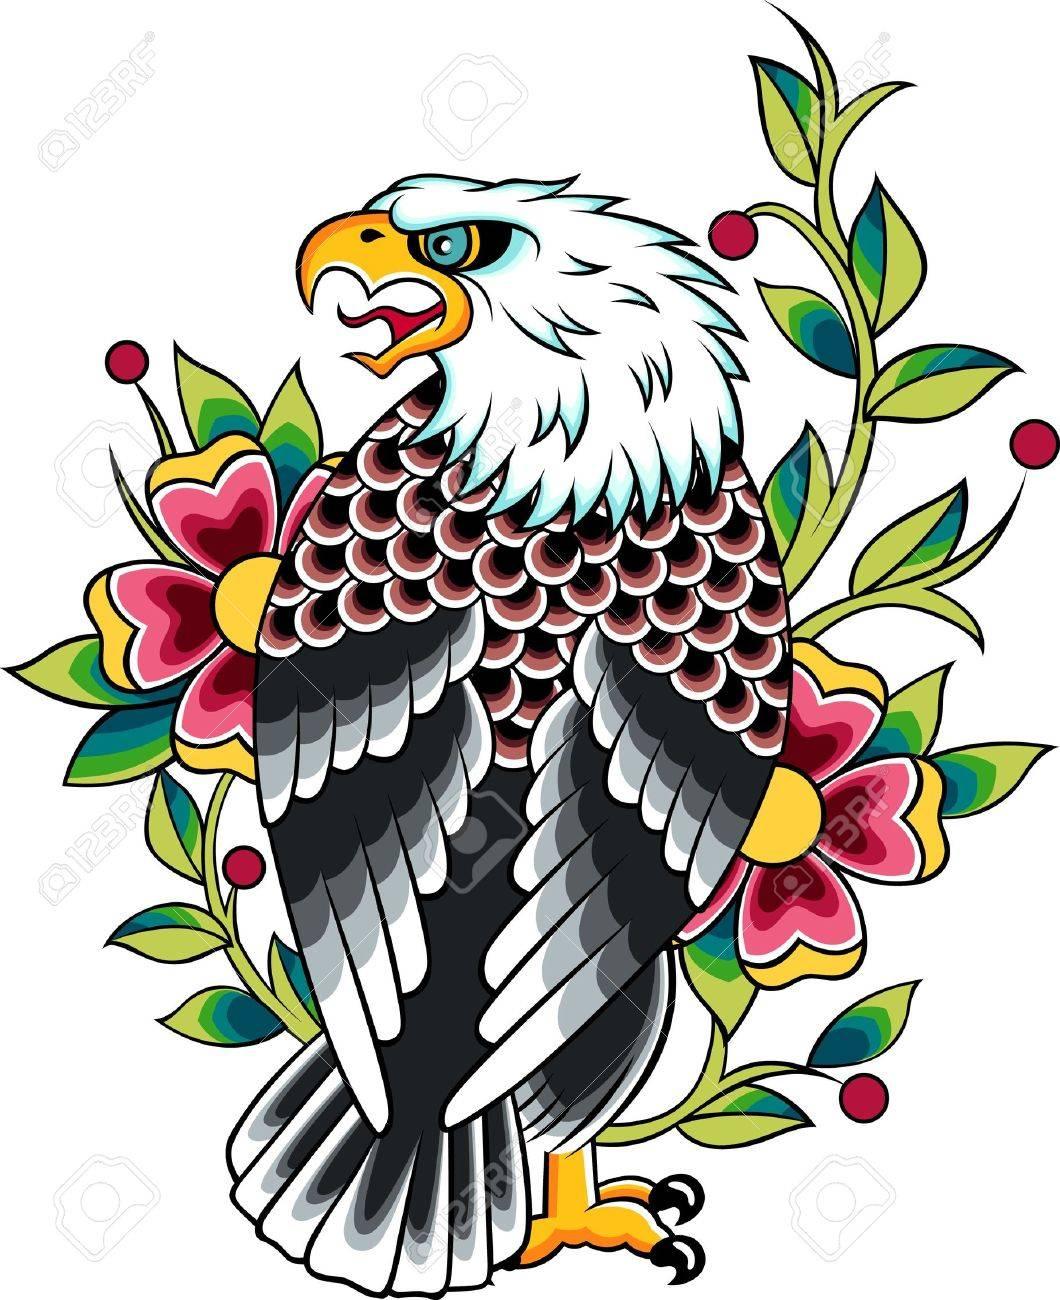 American eagle tattoos high quality photos and flash - Eagle Tattoo Stock Vector 10657349